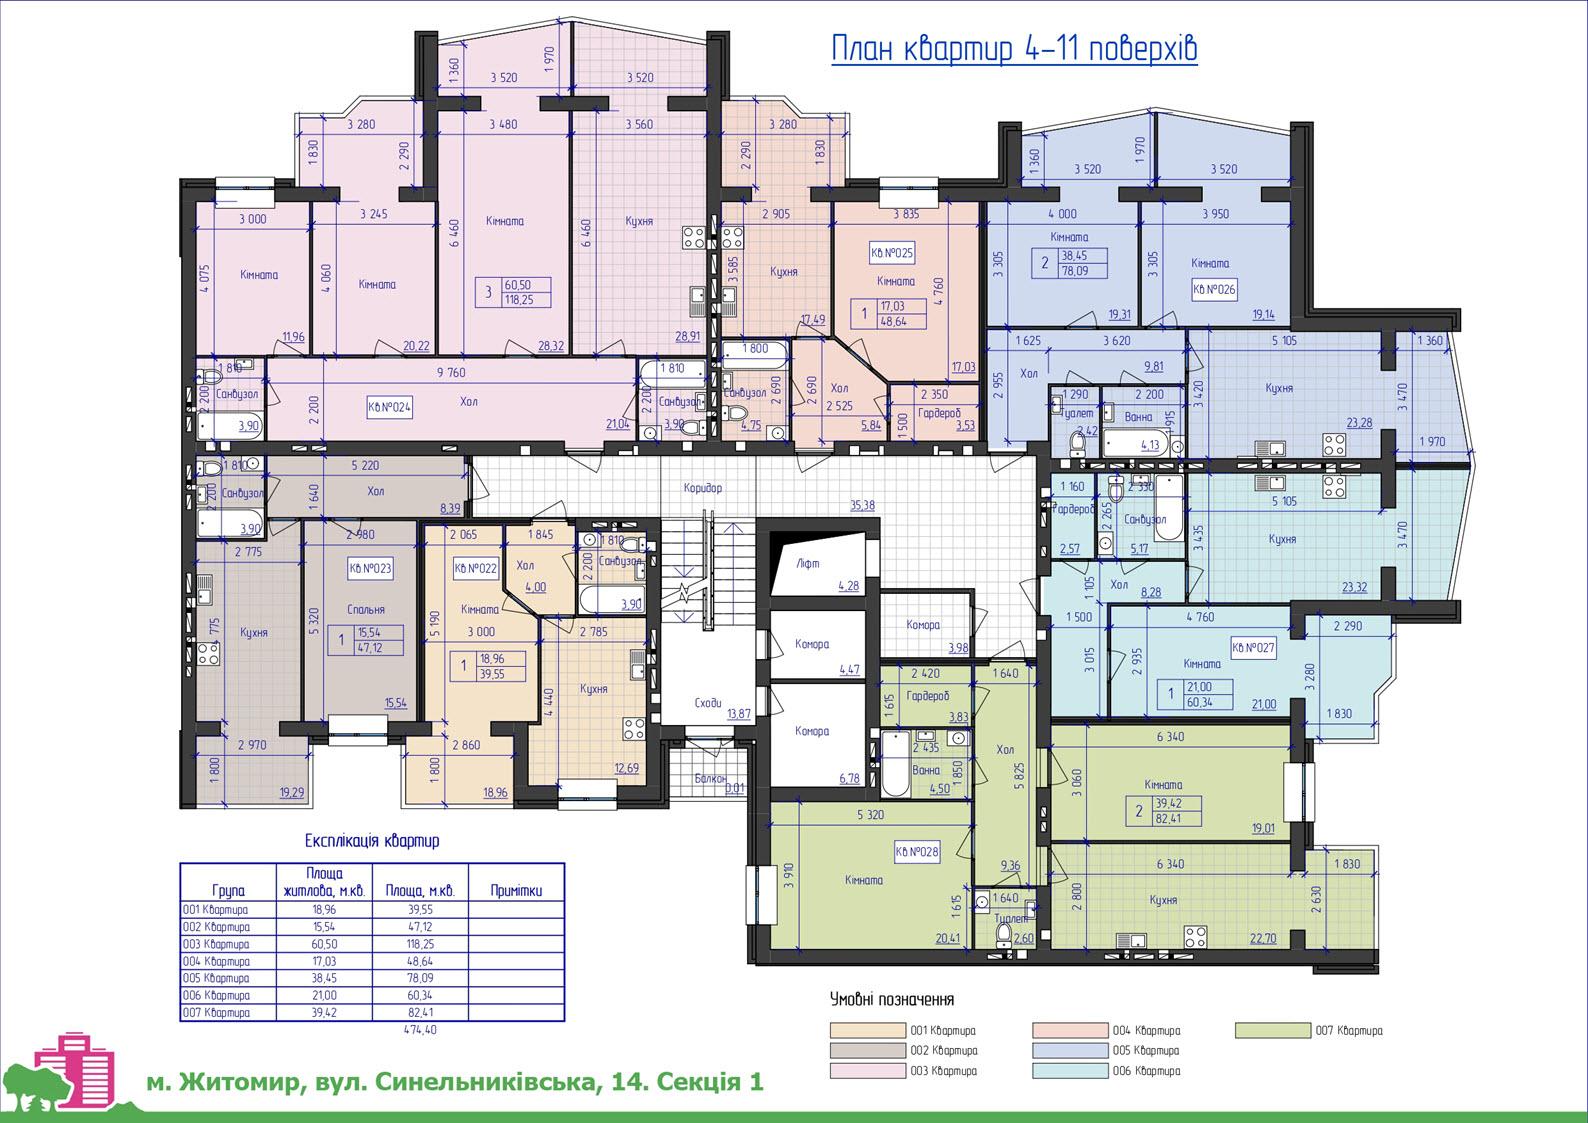 Типовой этаж 4-11